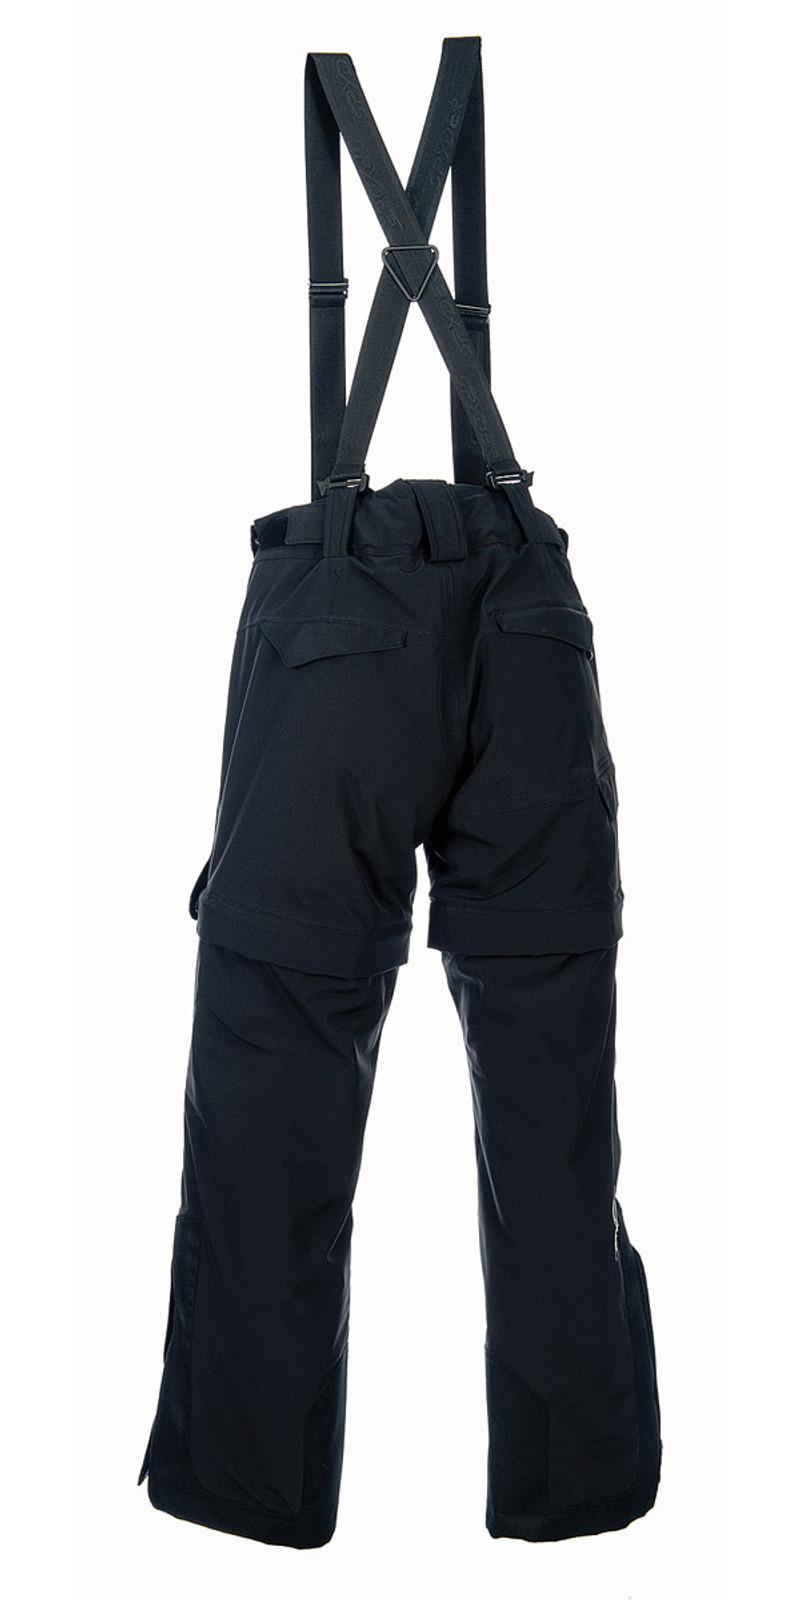 Women's Training Pants - Back View